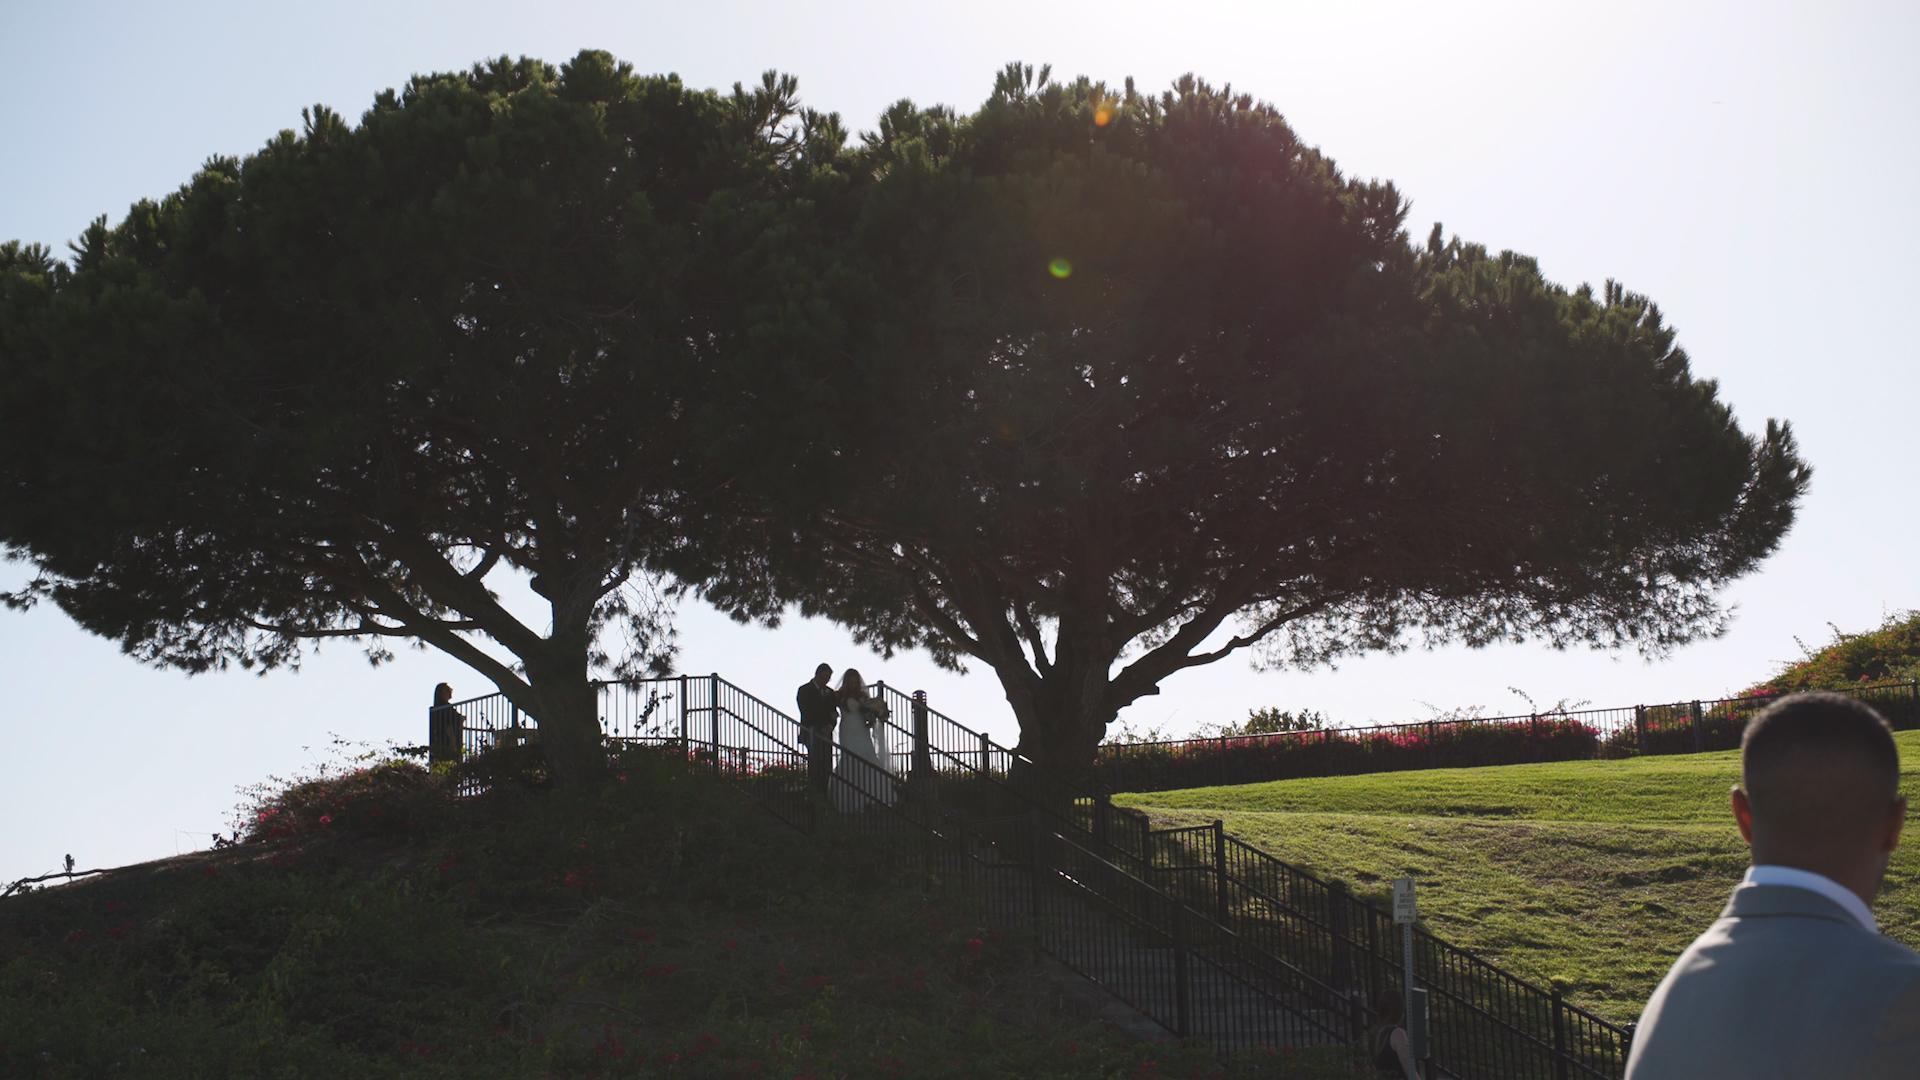 Bride by the Tree0.jpg